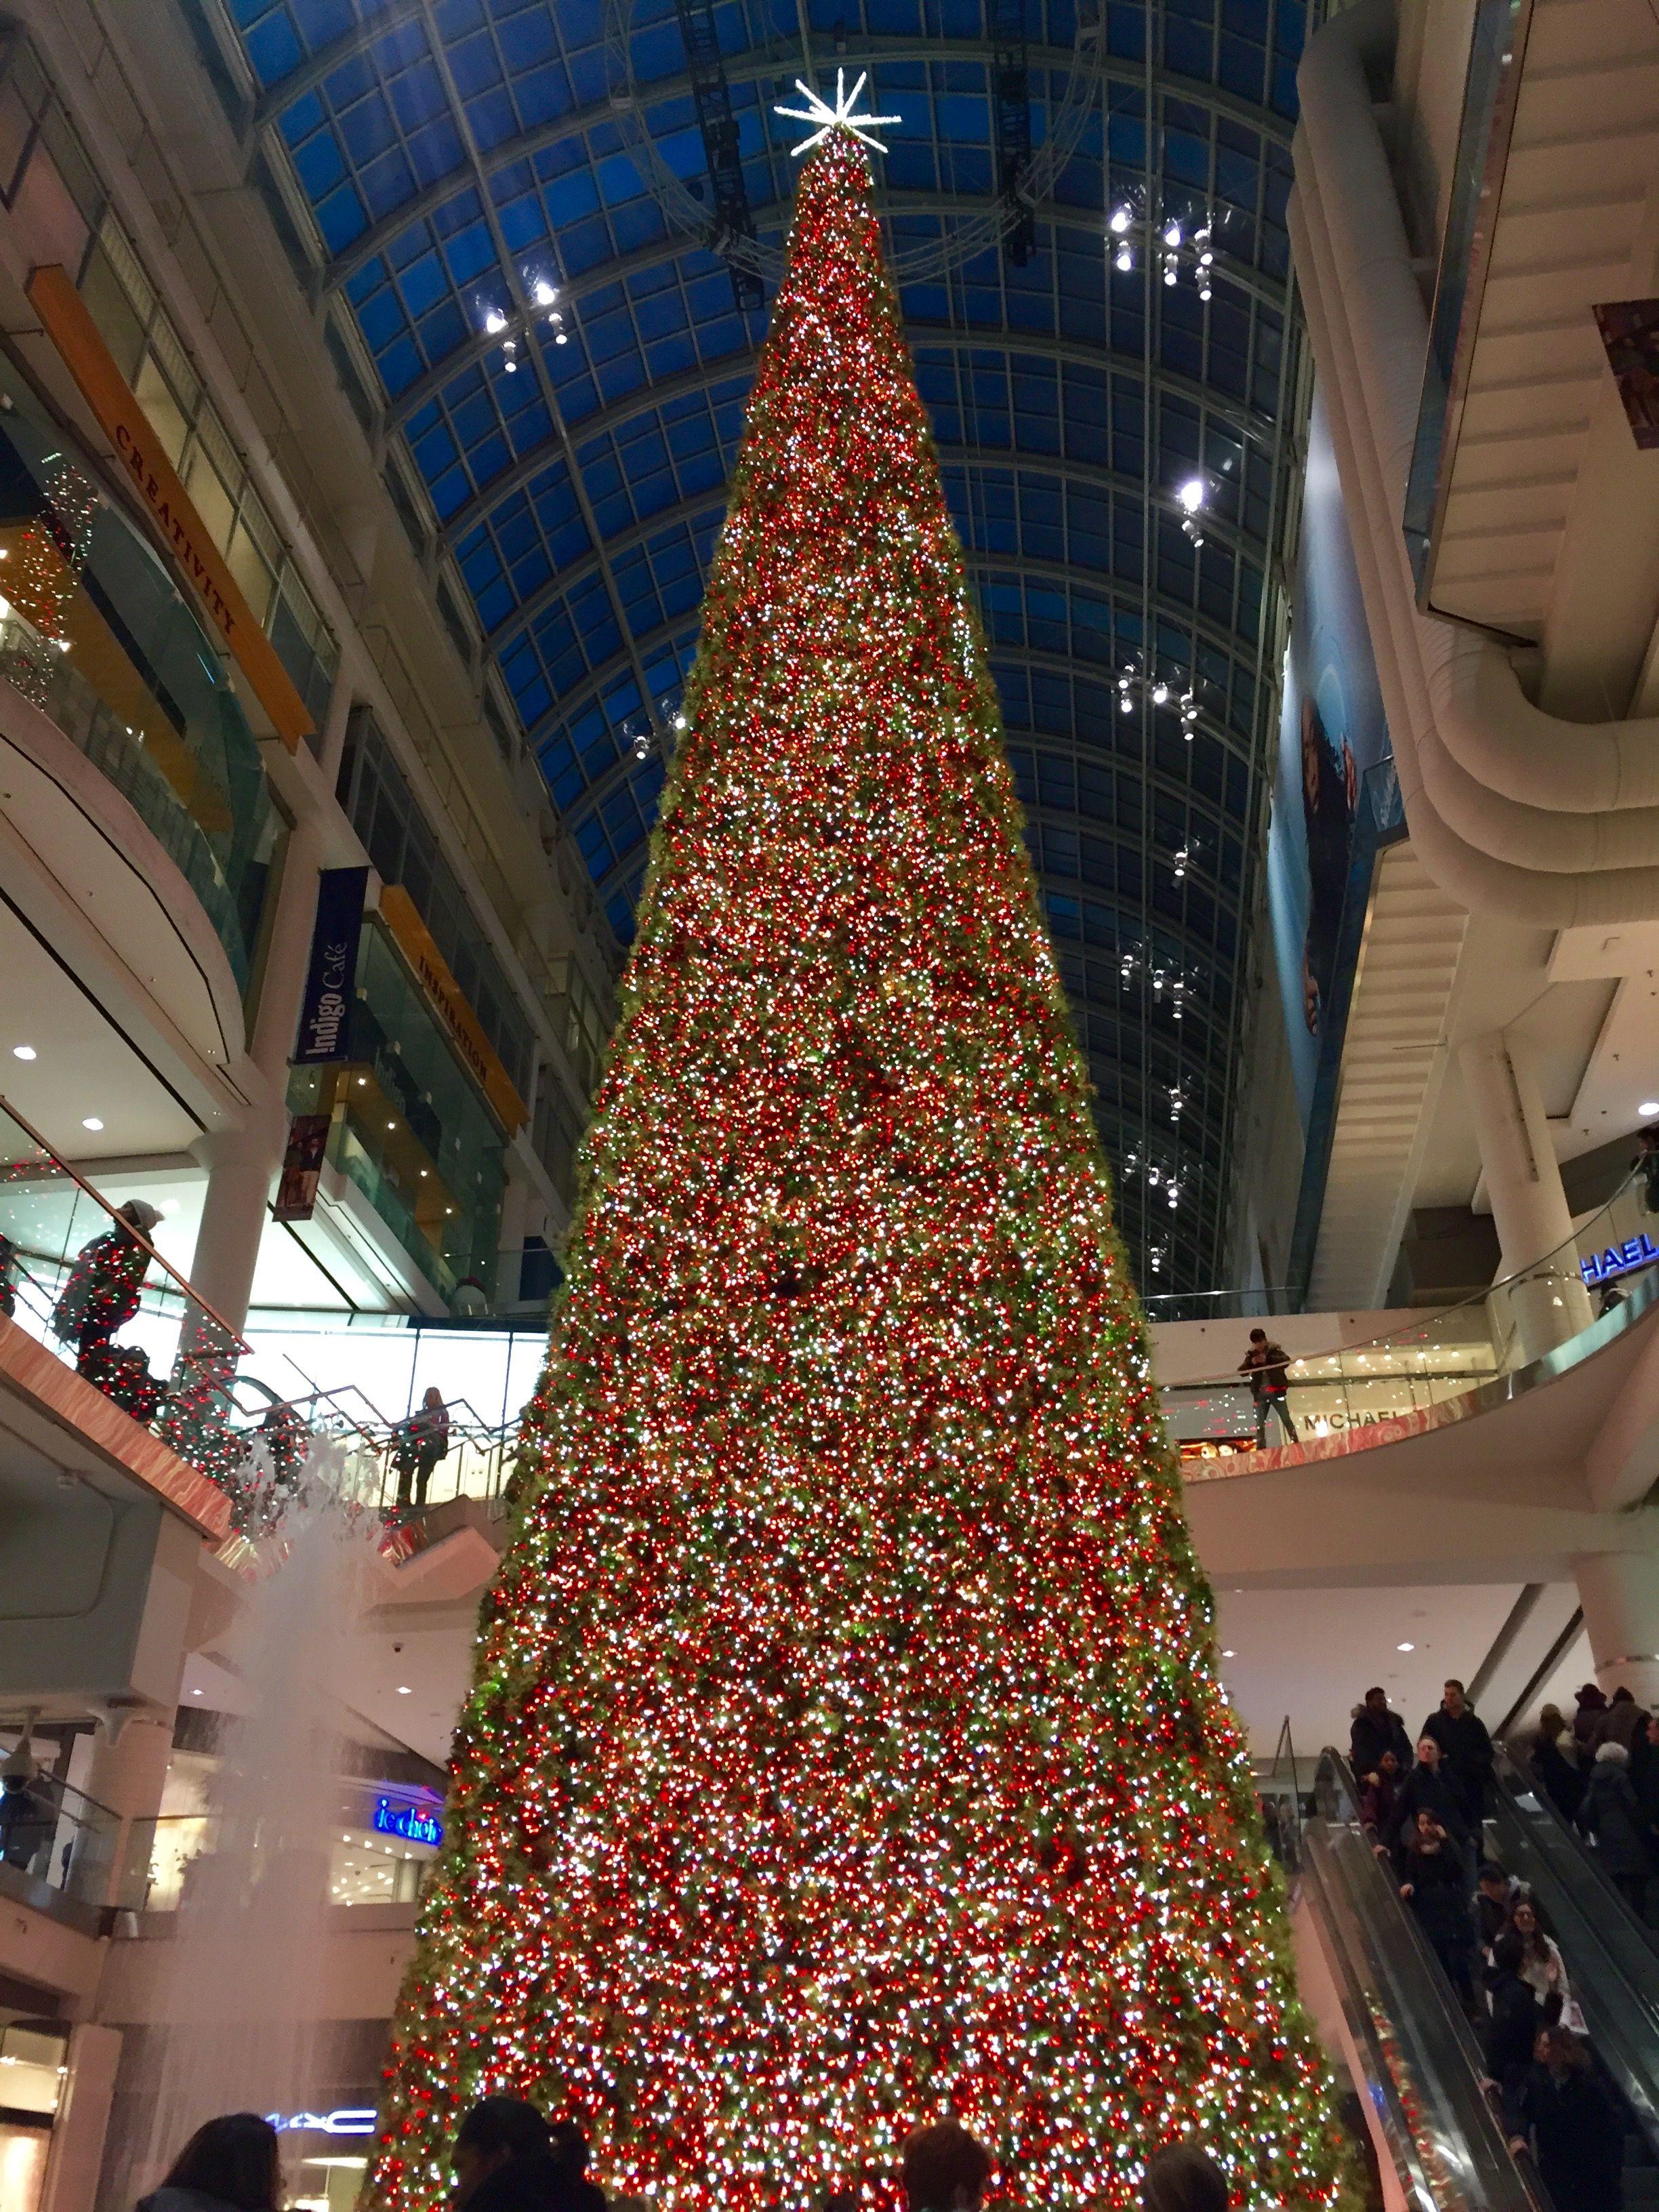 Christmas Tree Inside The Royal York Hotel, Toronto 2013 | Great Things In  Toronto | Pinterest | Trees, Toronto And Christmas Trees